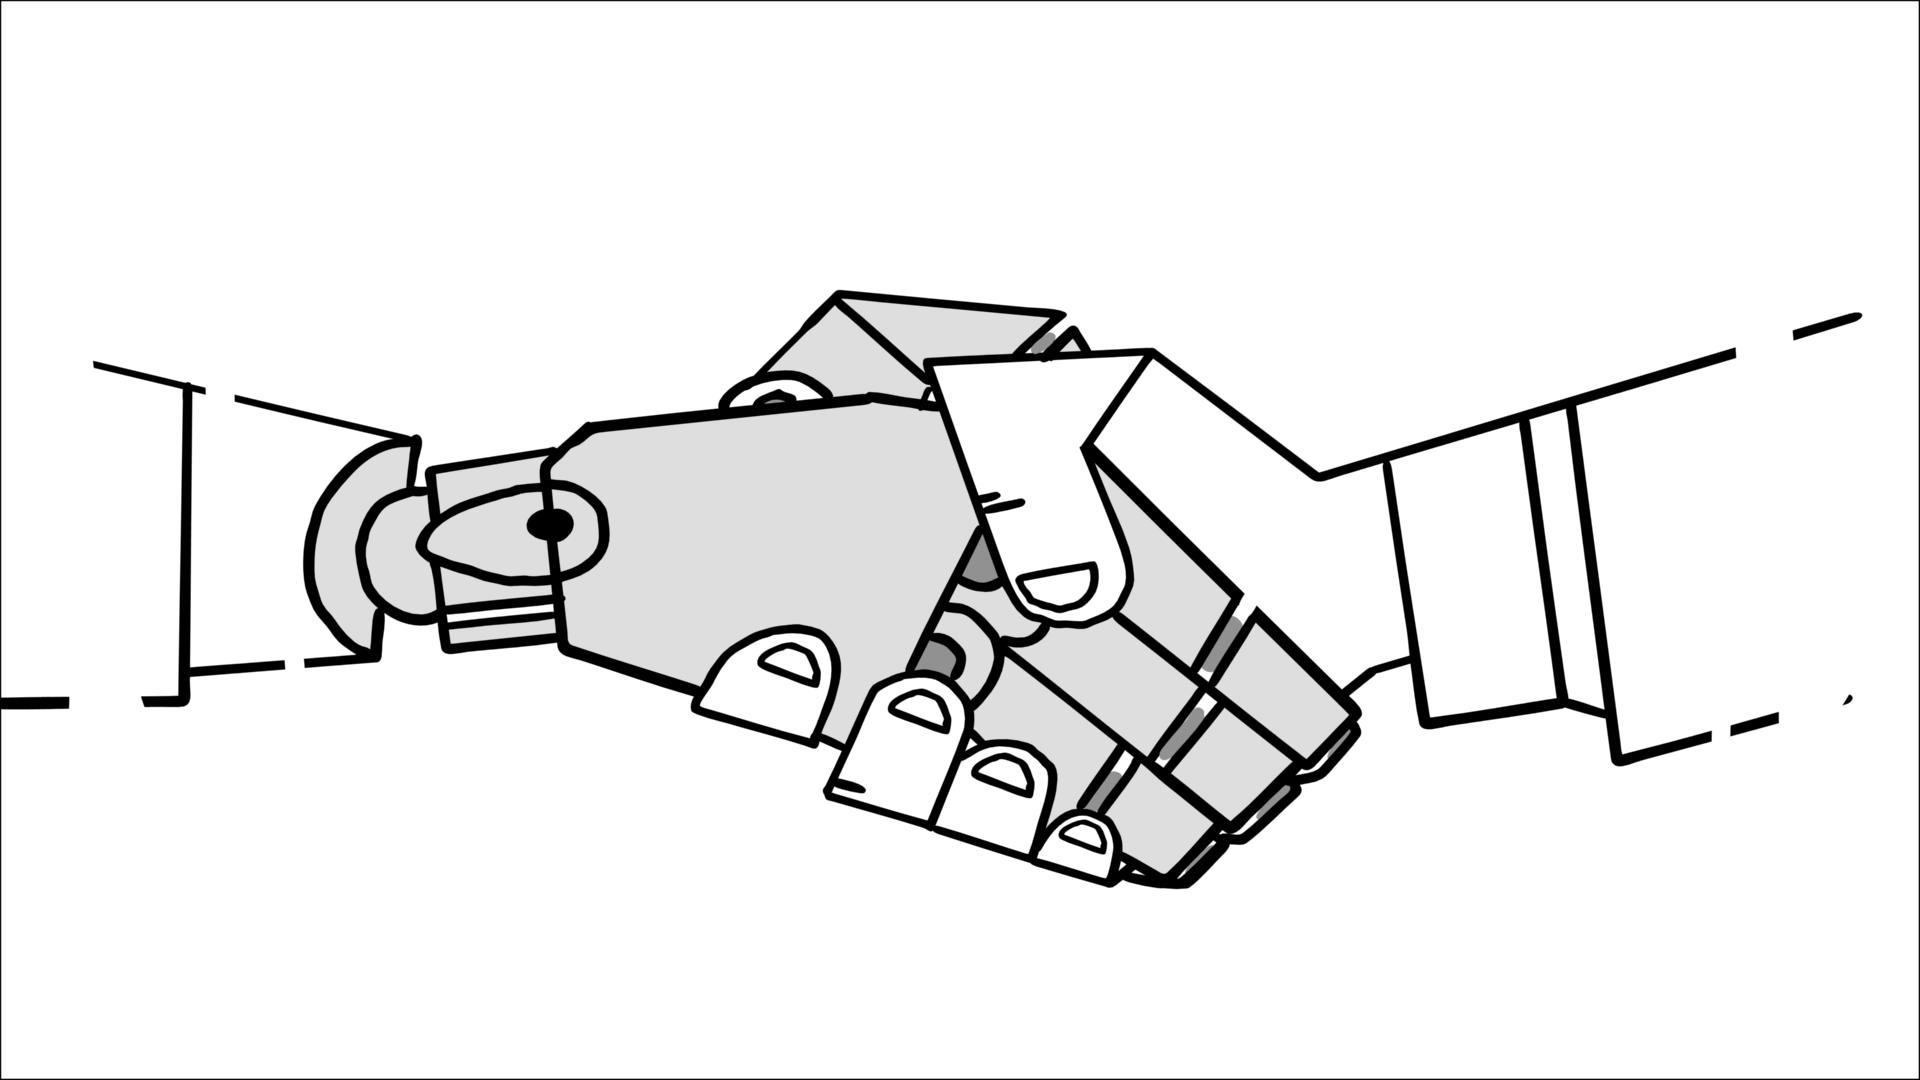 Cognizant_Storyboards_001-1-08.jpg